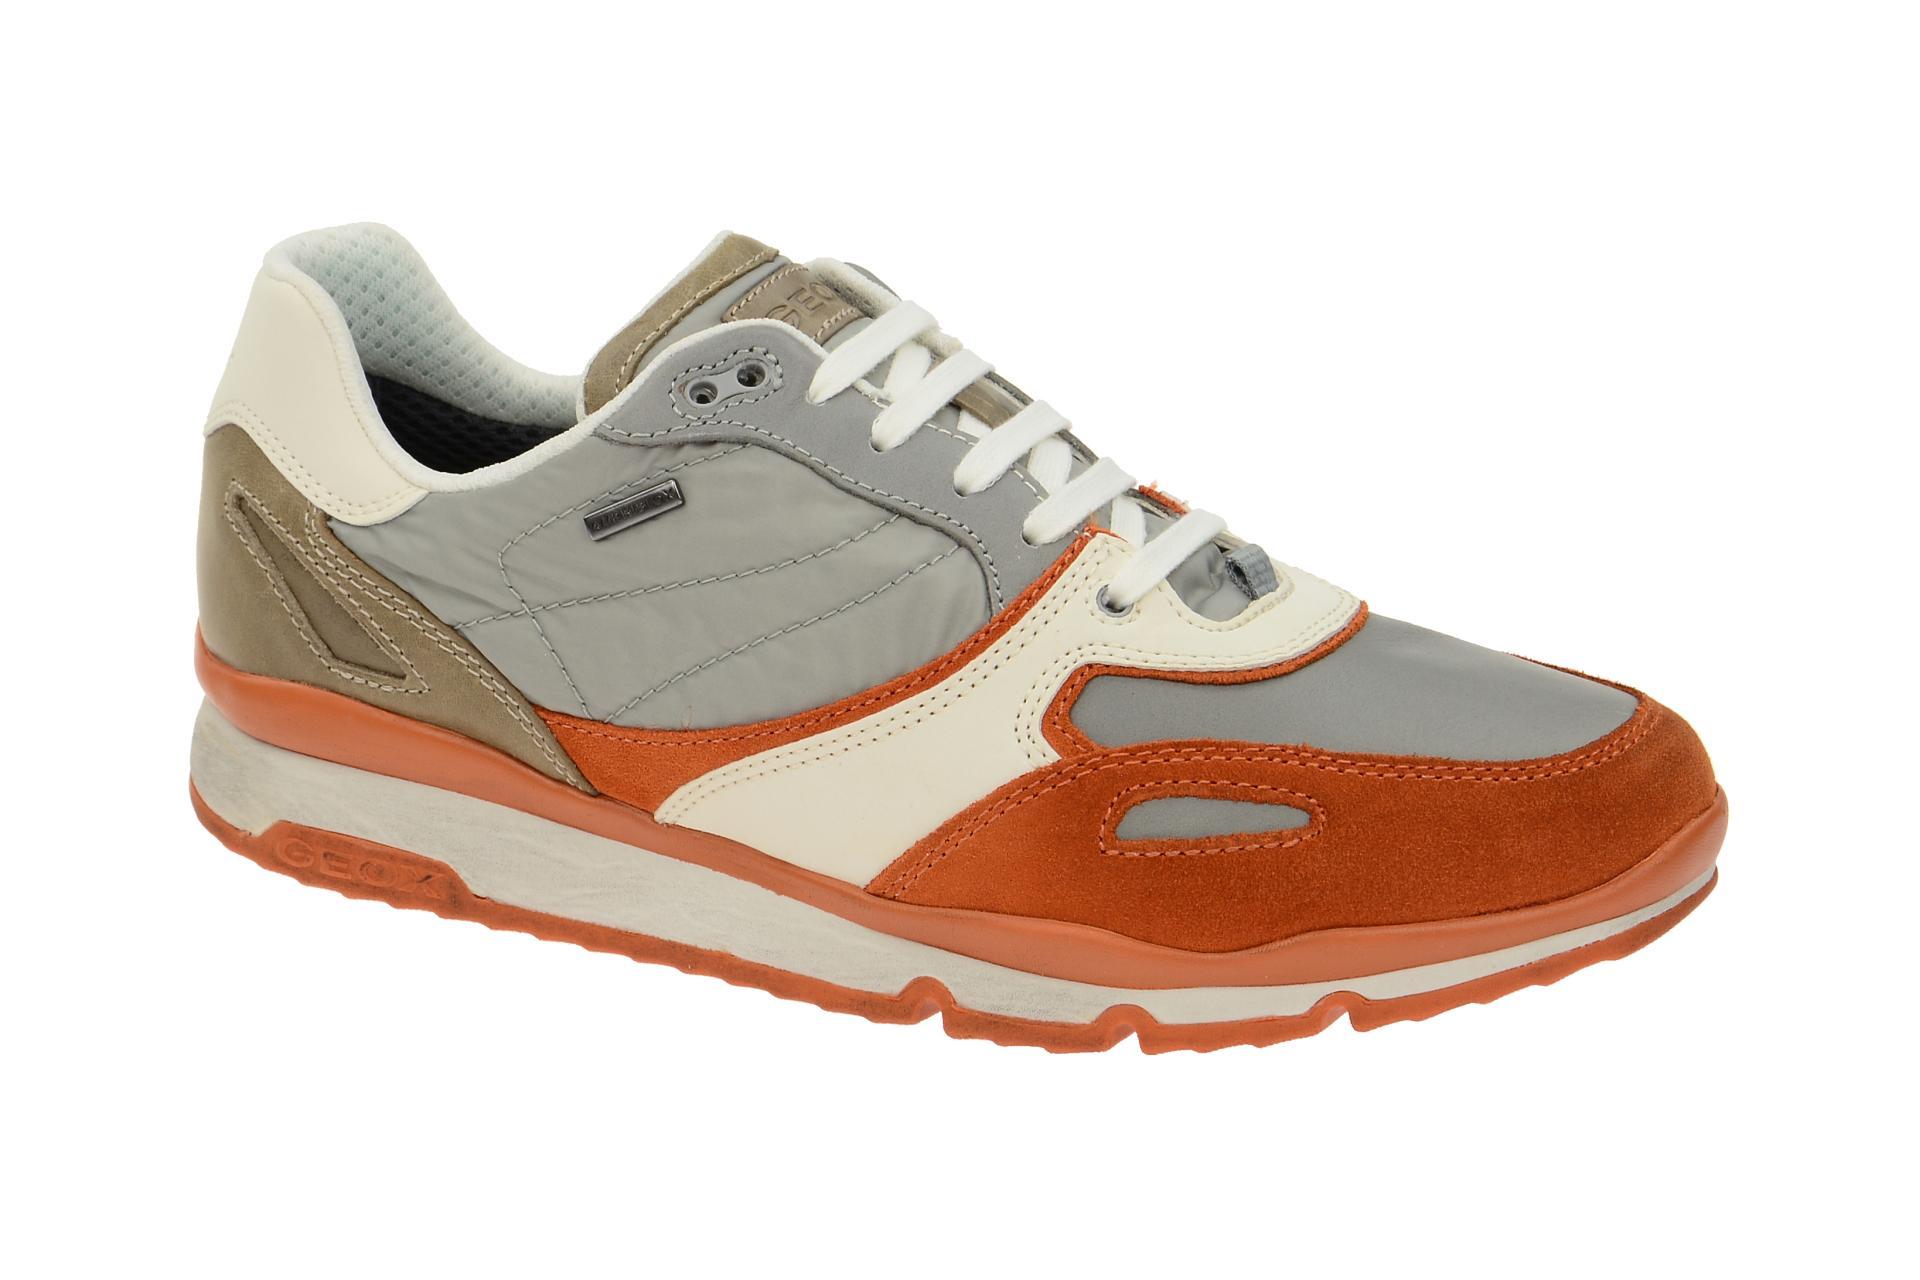 Geox Sandro Schuhe orange grau Wasserdicht U44S7A